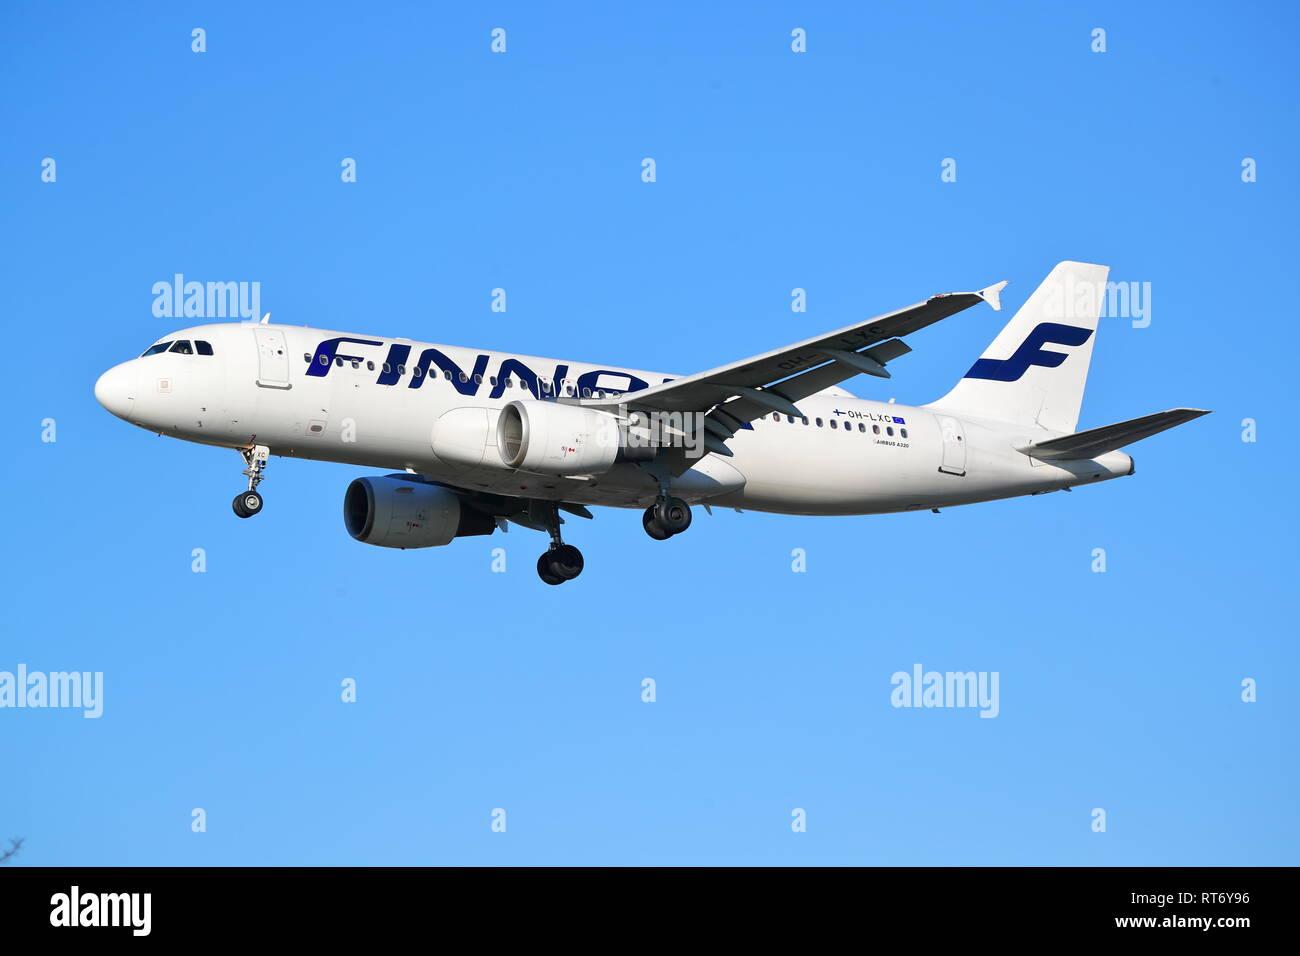 Finnair Airbus A320 OH-LXC landing at London Heathrow Airport, UK - Stock Image